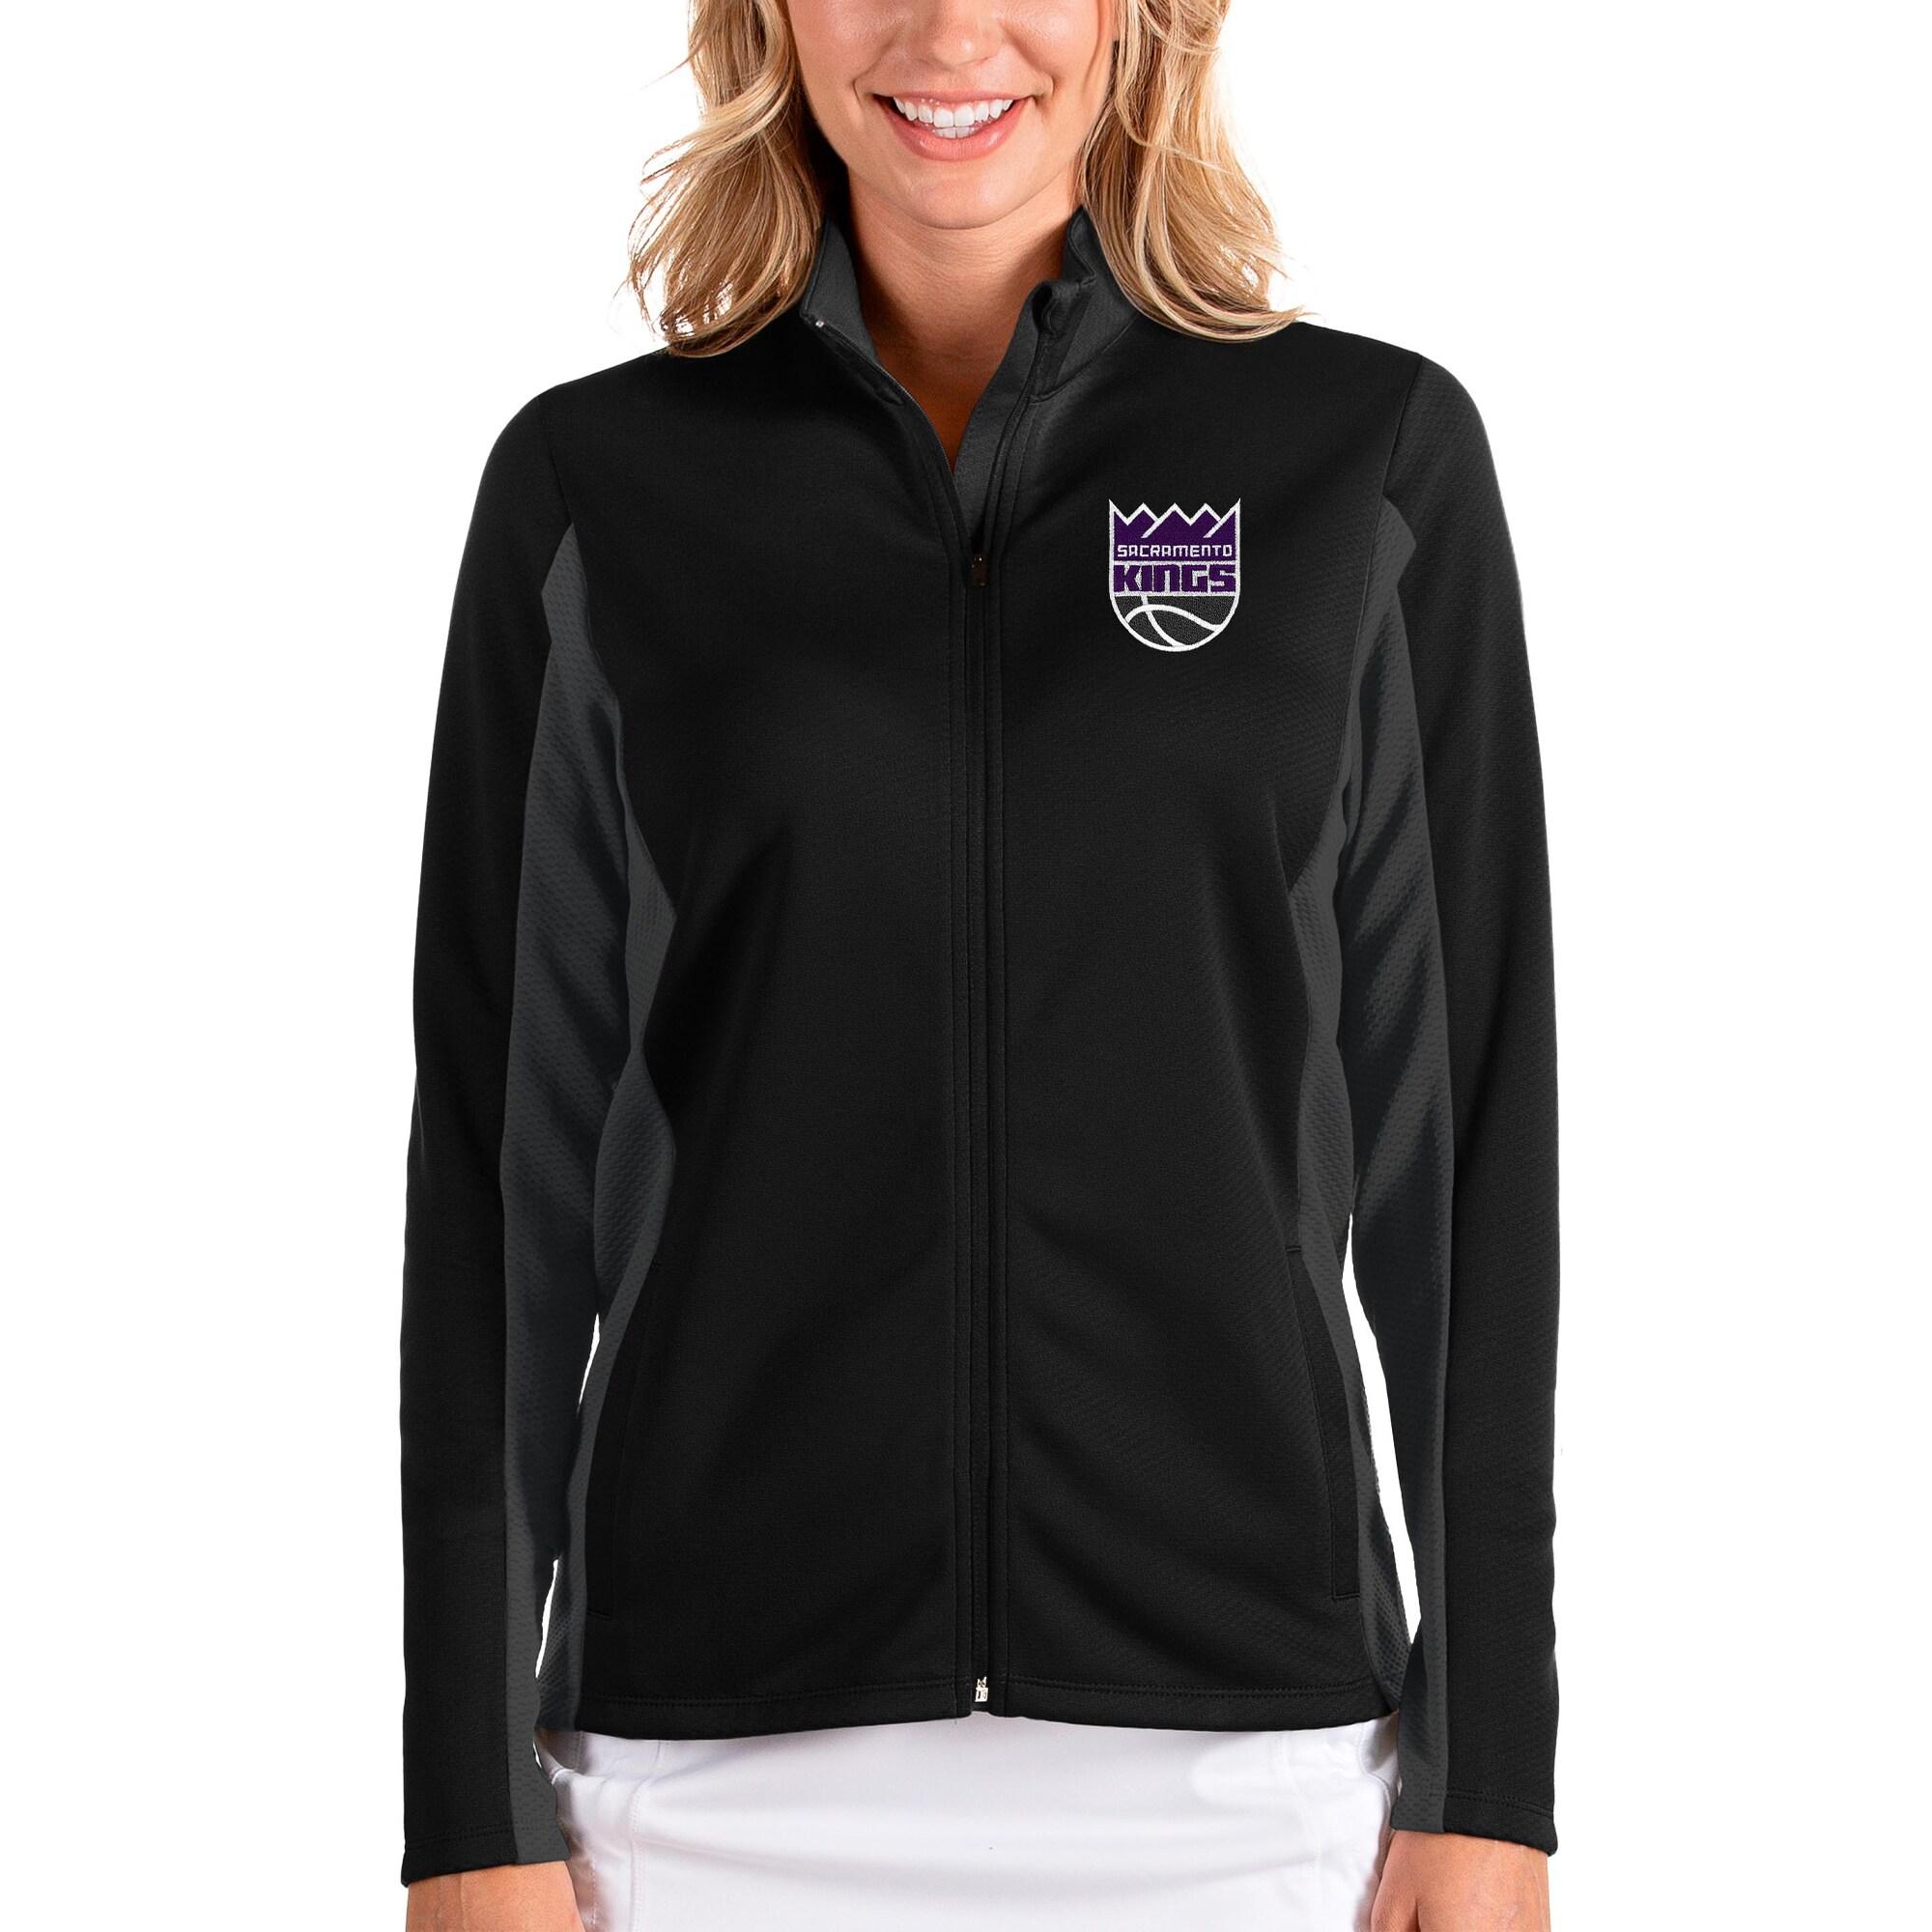 Sacramento Kings Antigua Women's Passage Full-Zip Jacket - Black/Charcoal